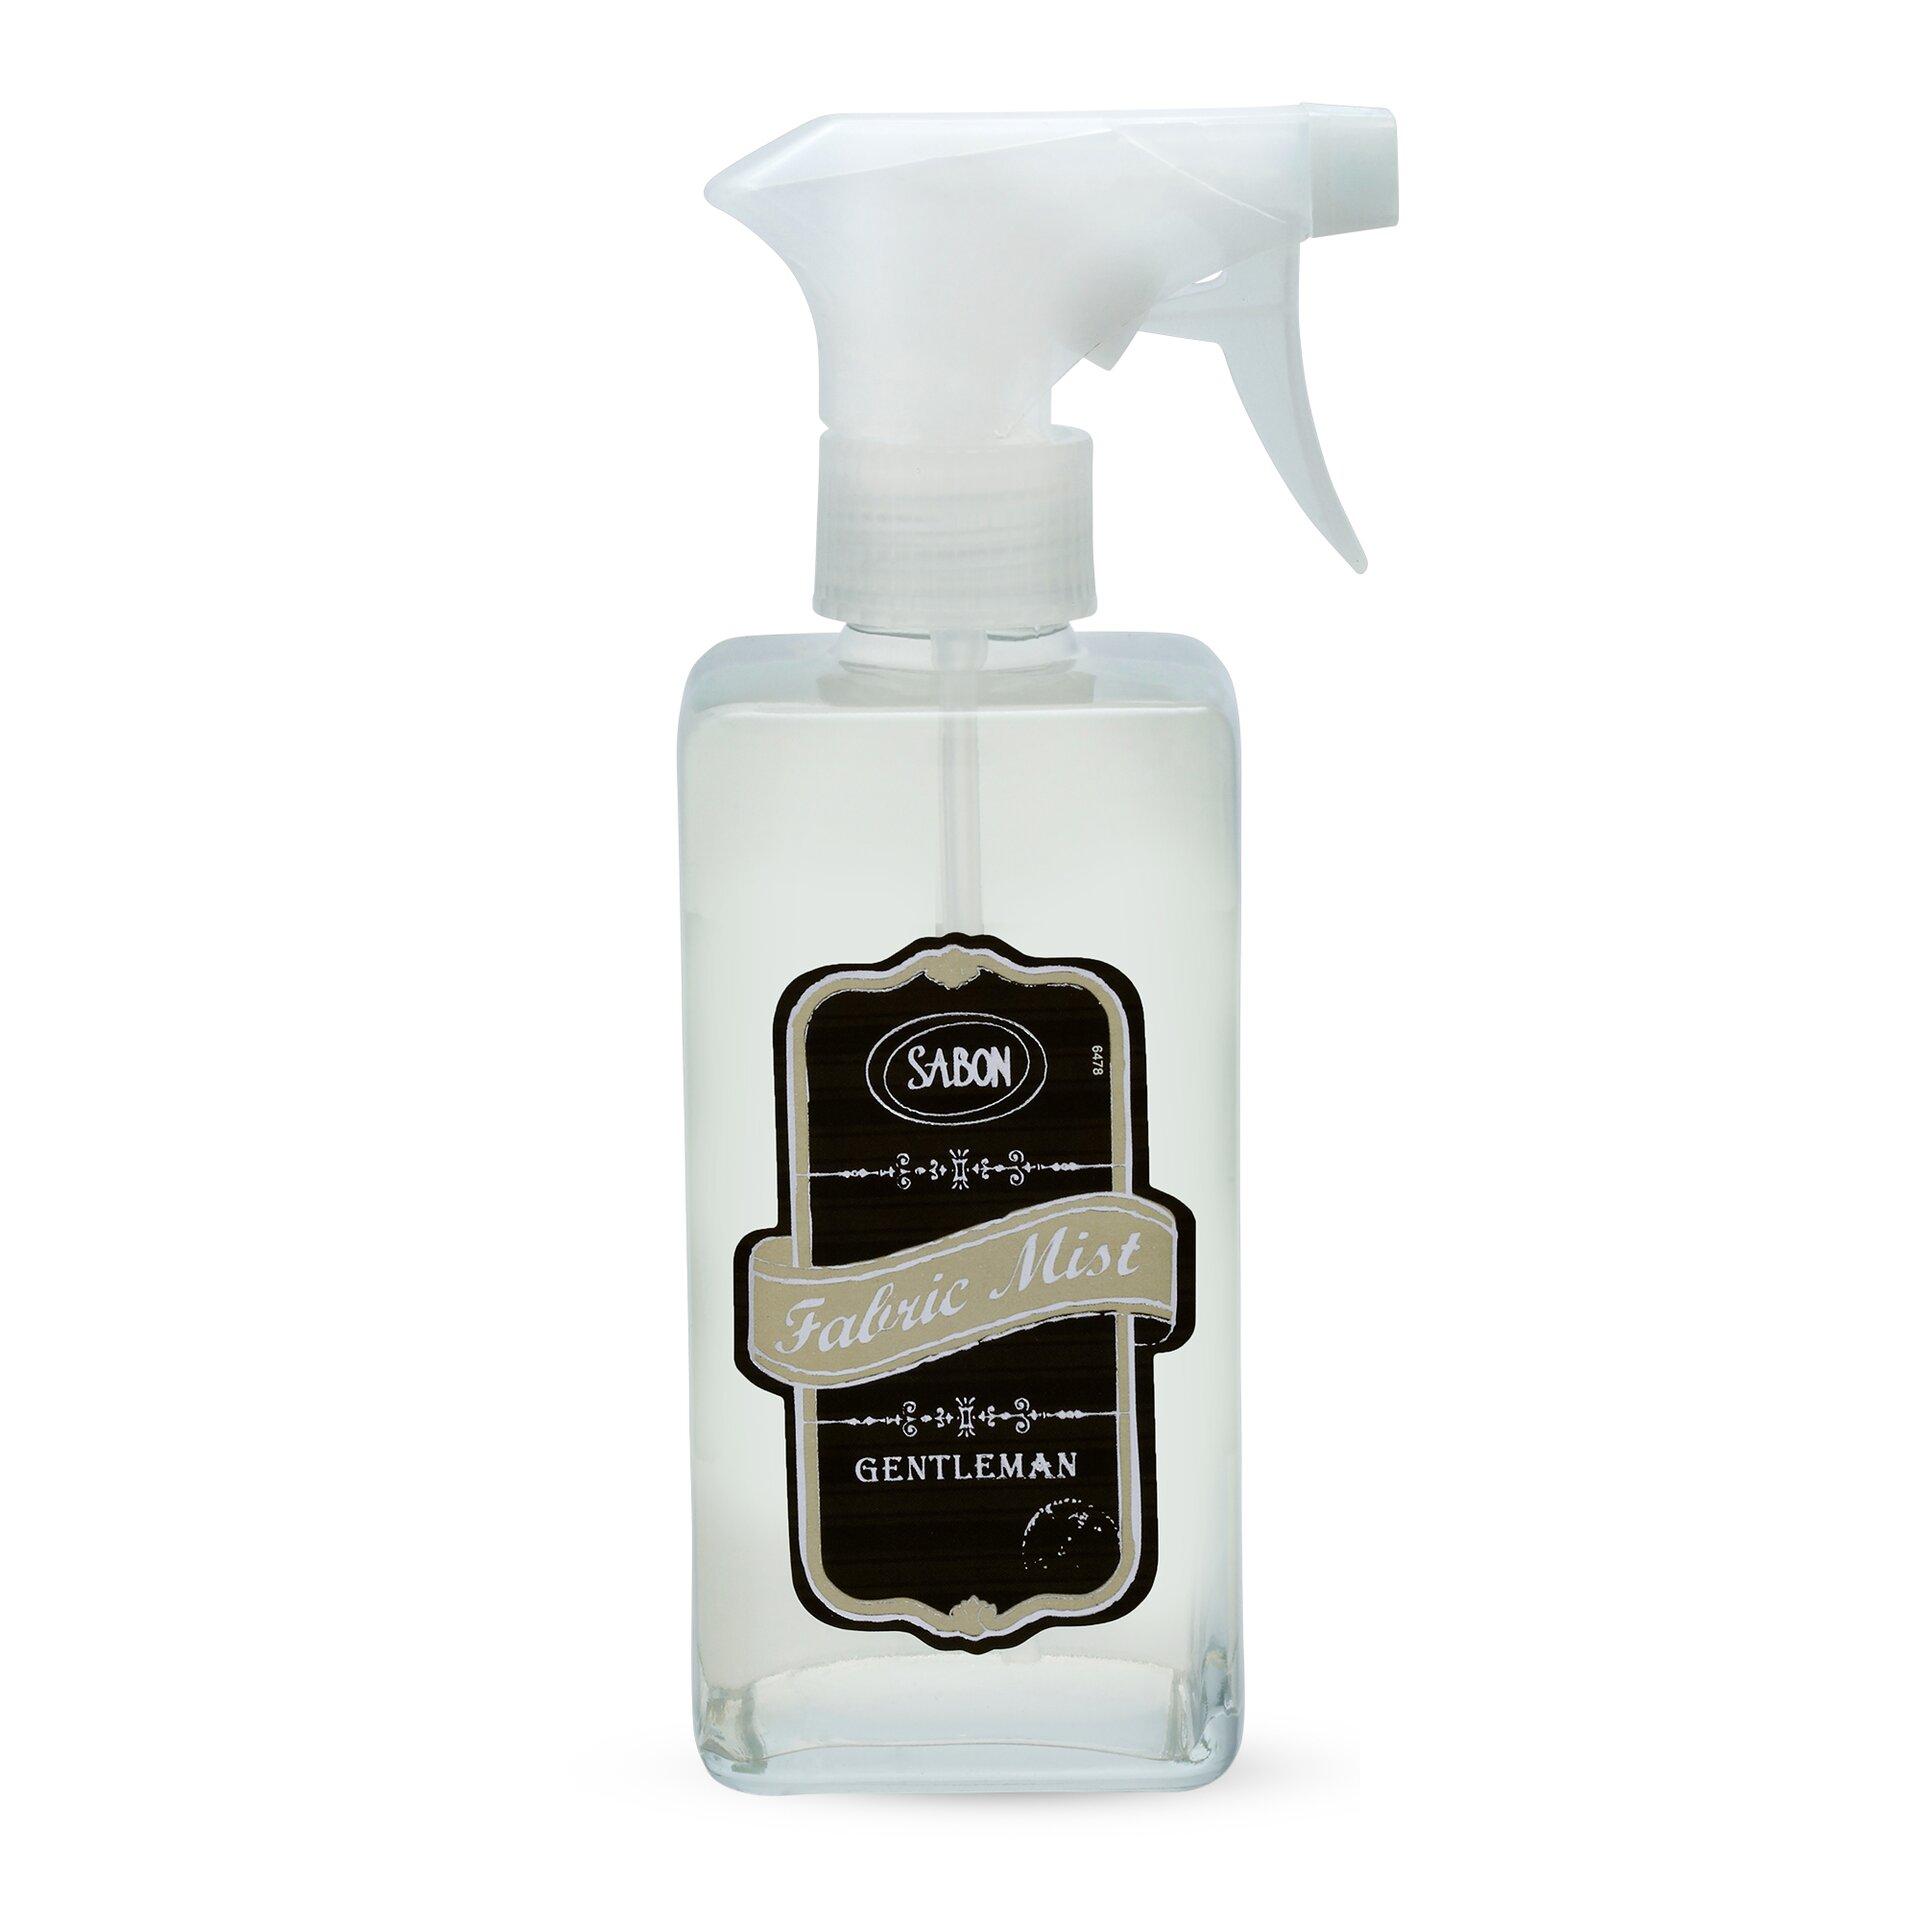 Parfum pentru textile Gentleman sabon.ro